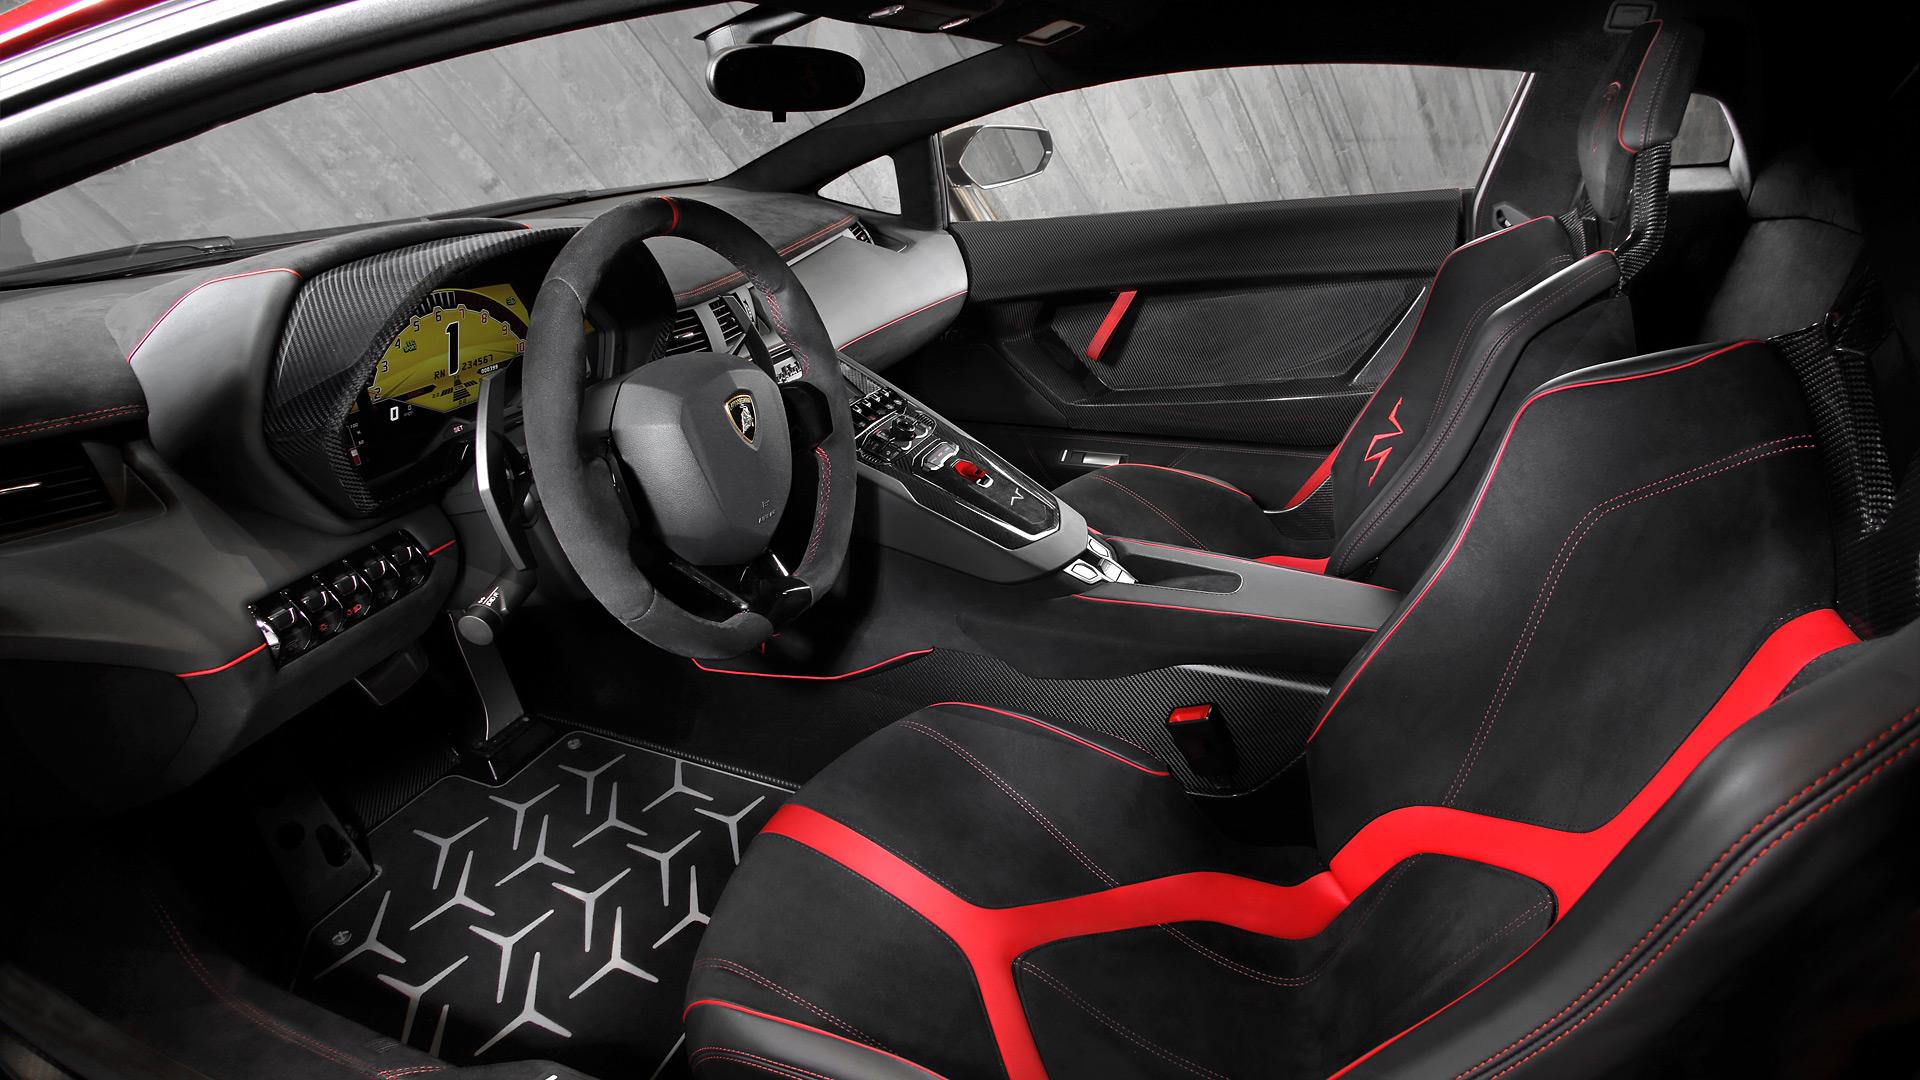 Lamborghini-Aventador-LP750-4-SV – 08